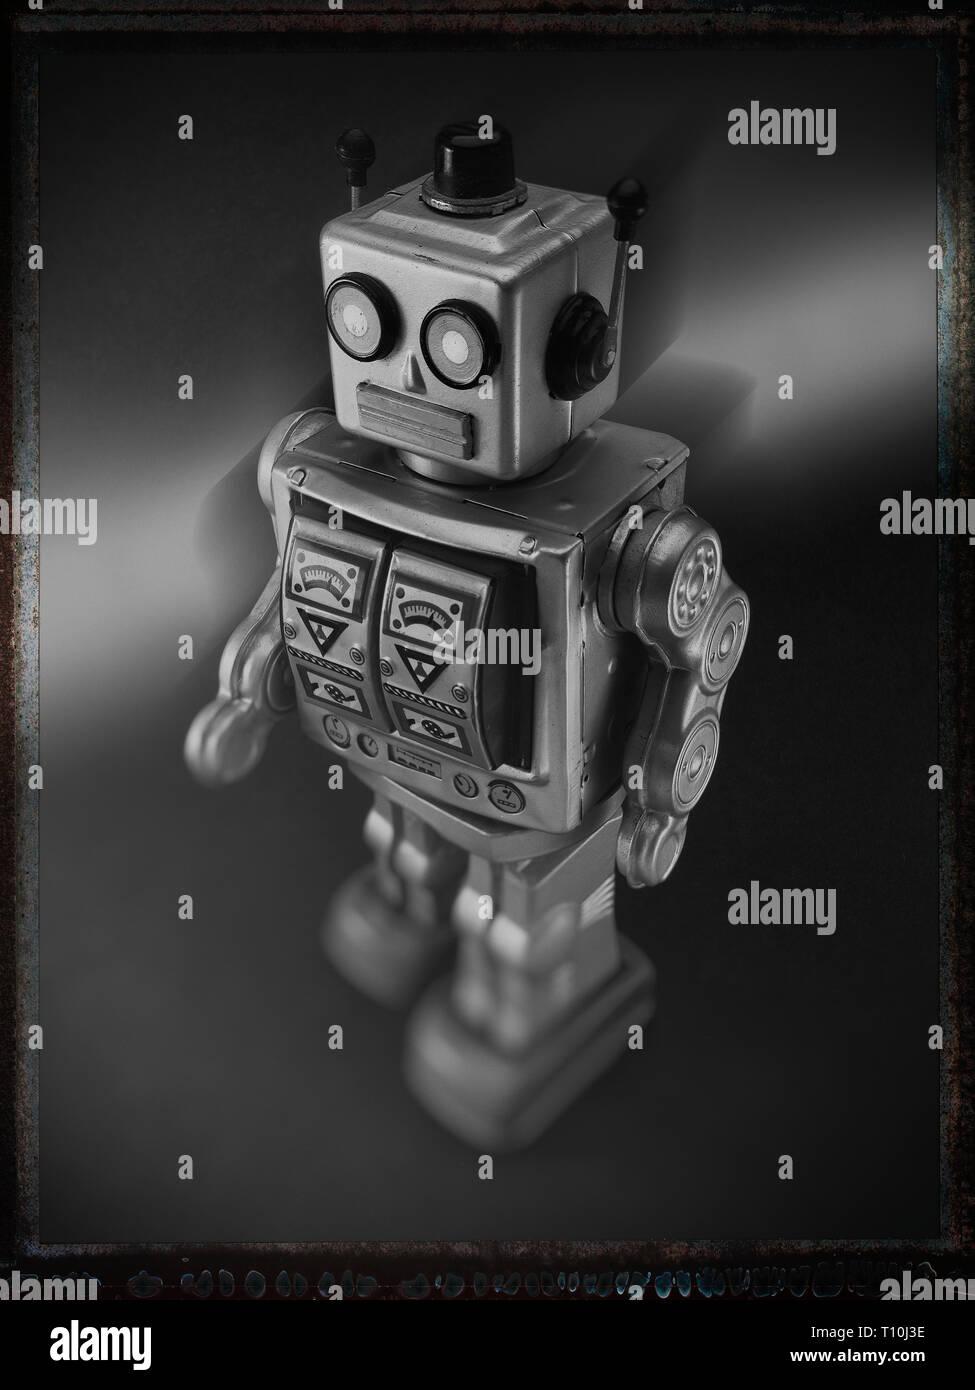 black and white image of toy tin robot Stock Photo